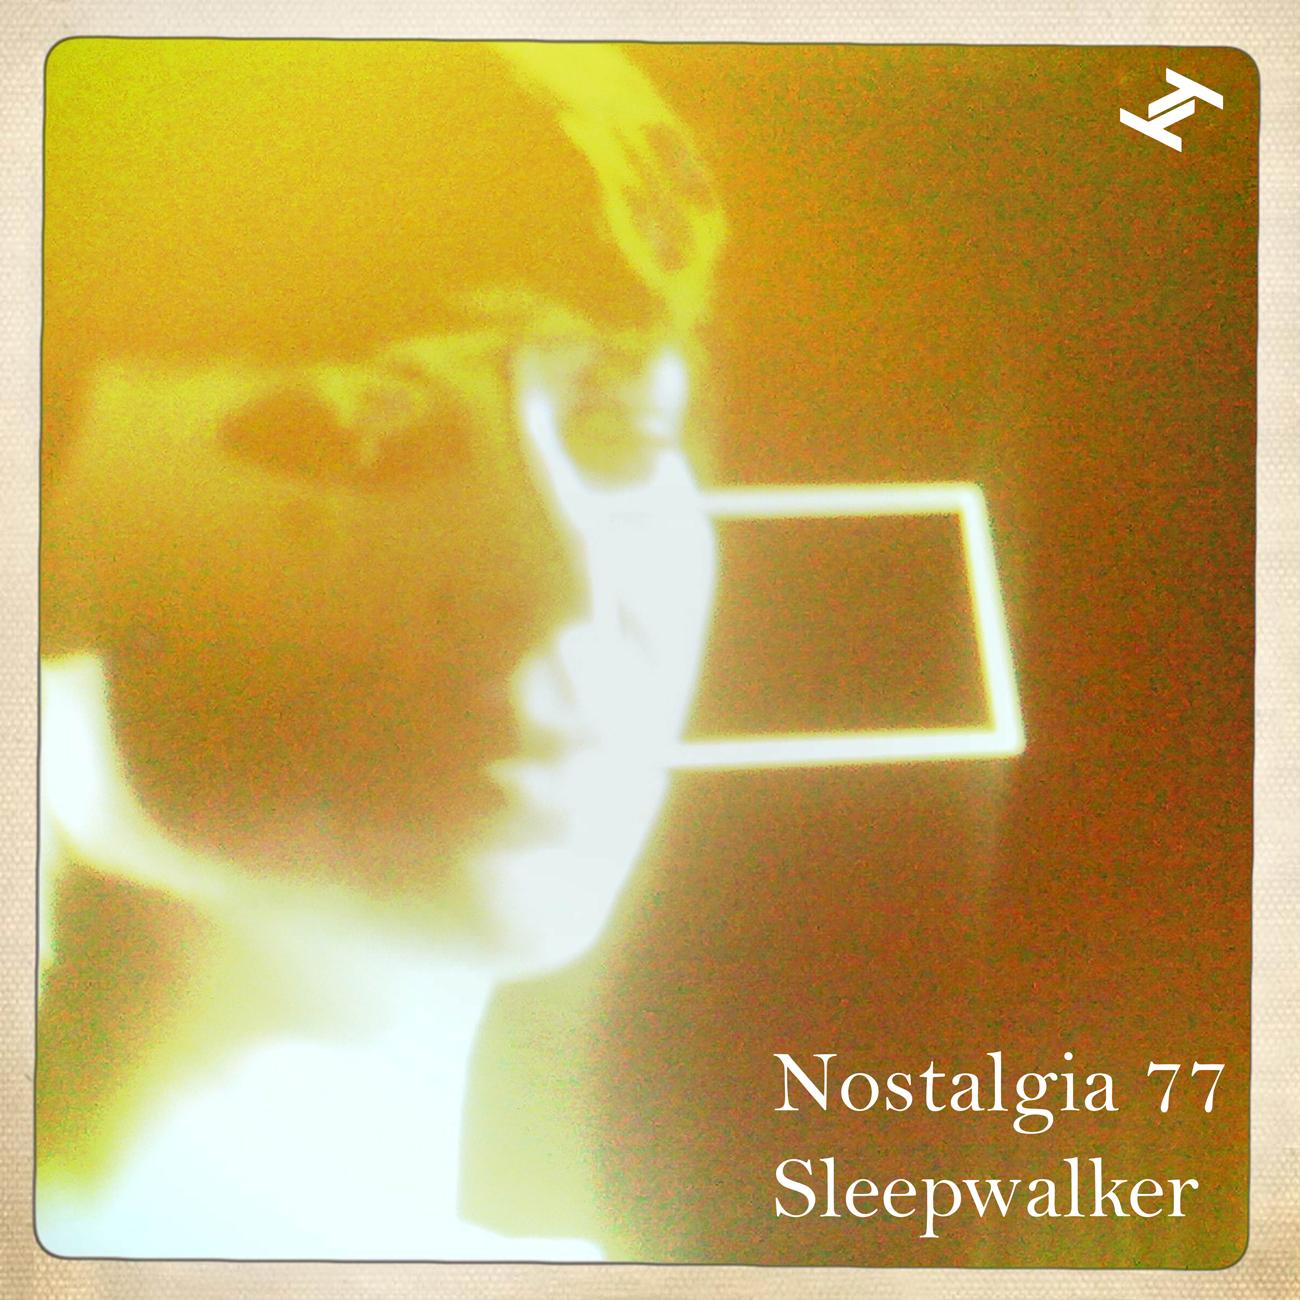 Nostalgia 77 - Golden Morning (Mark de Clive-Lowe Remix)